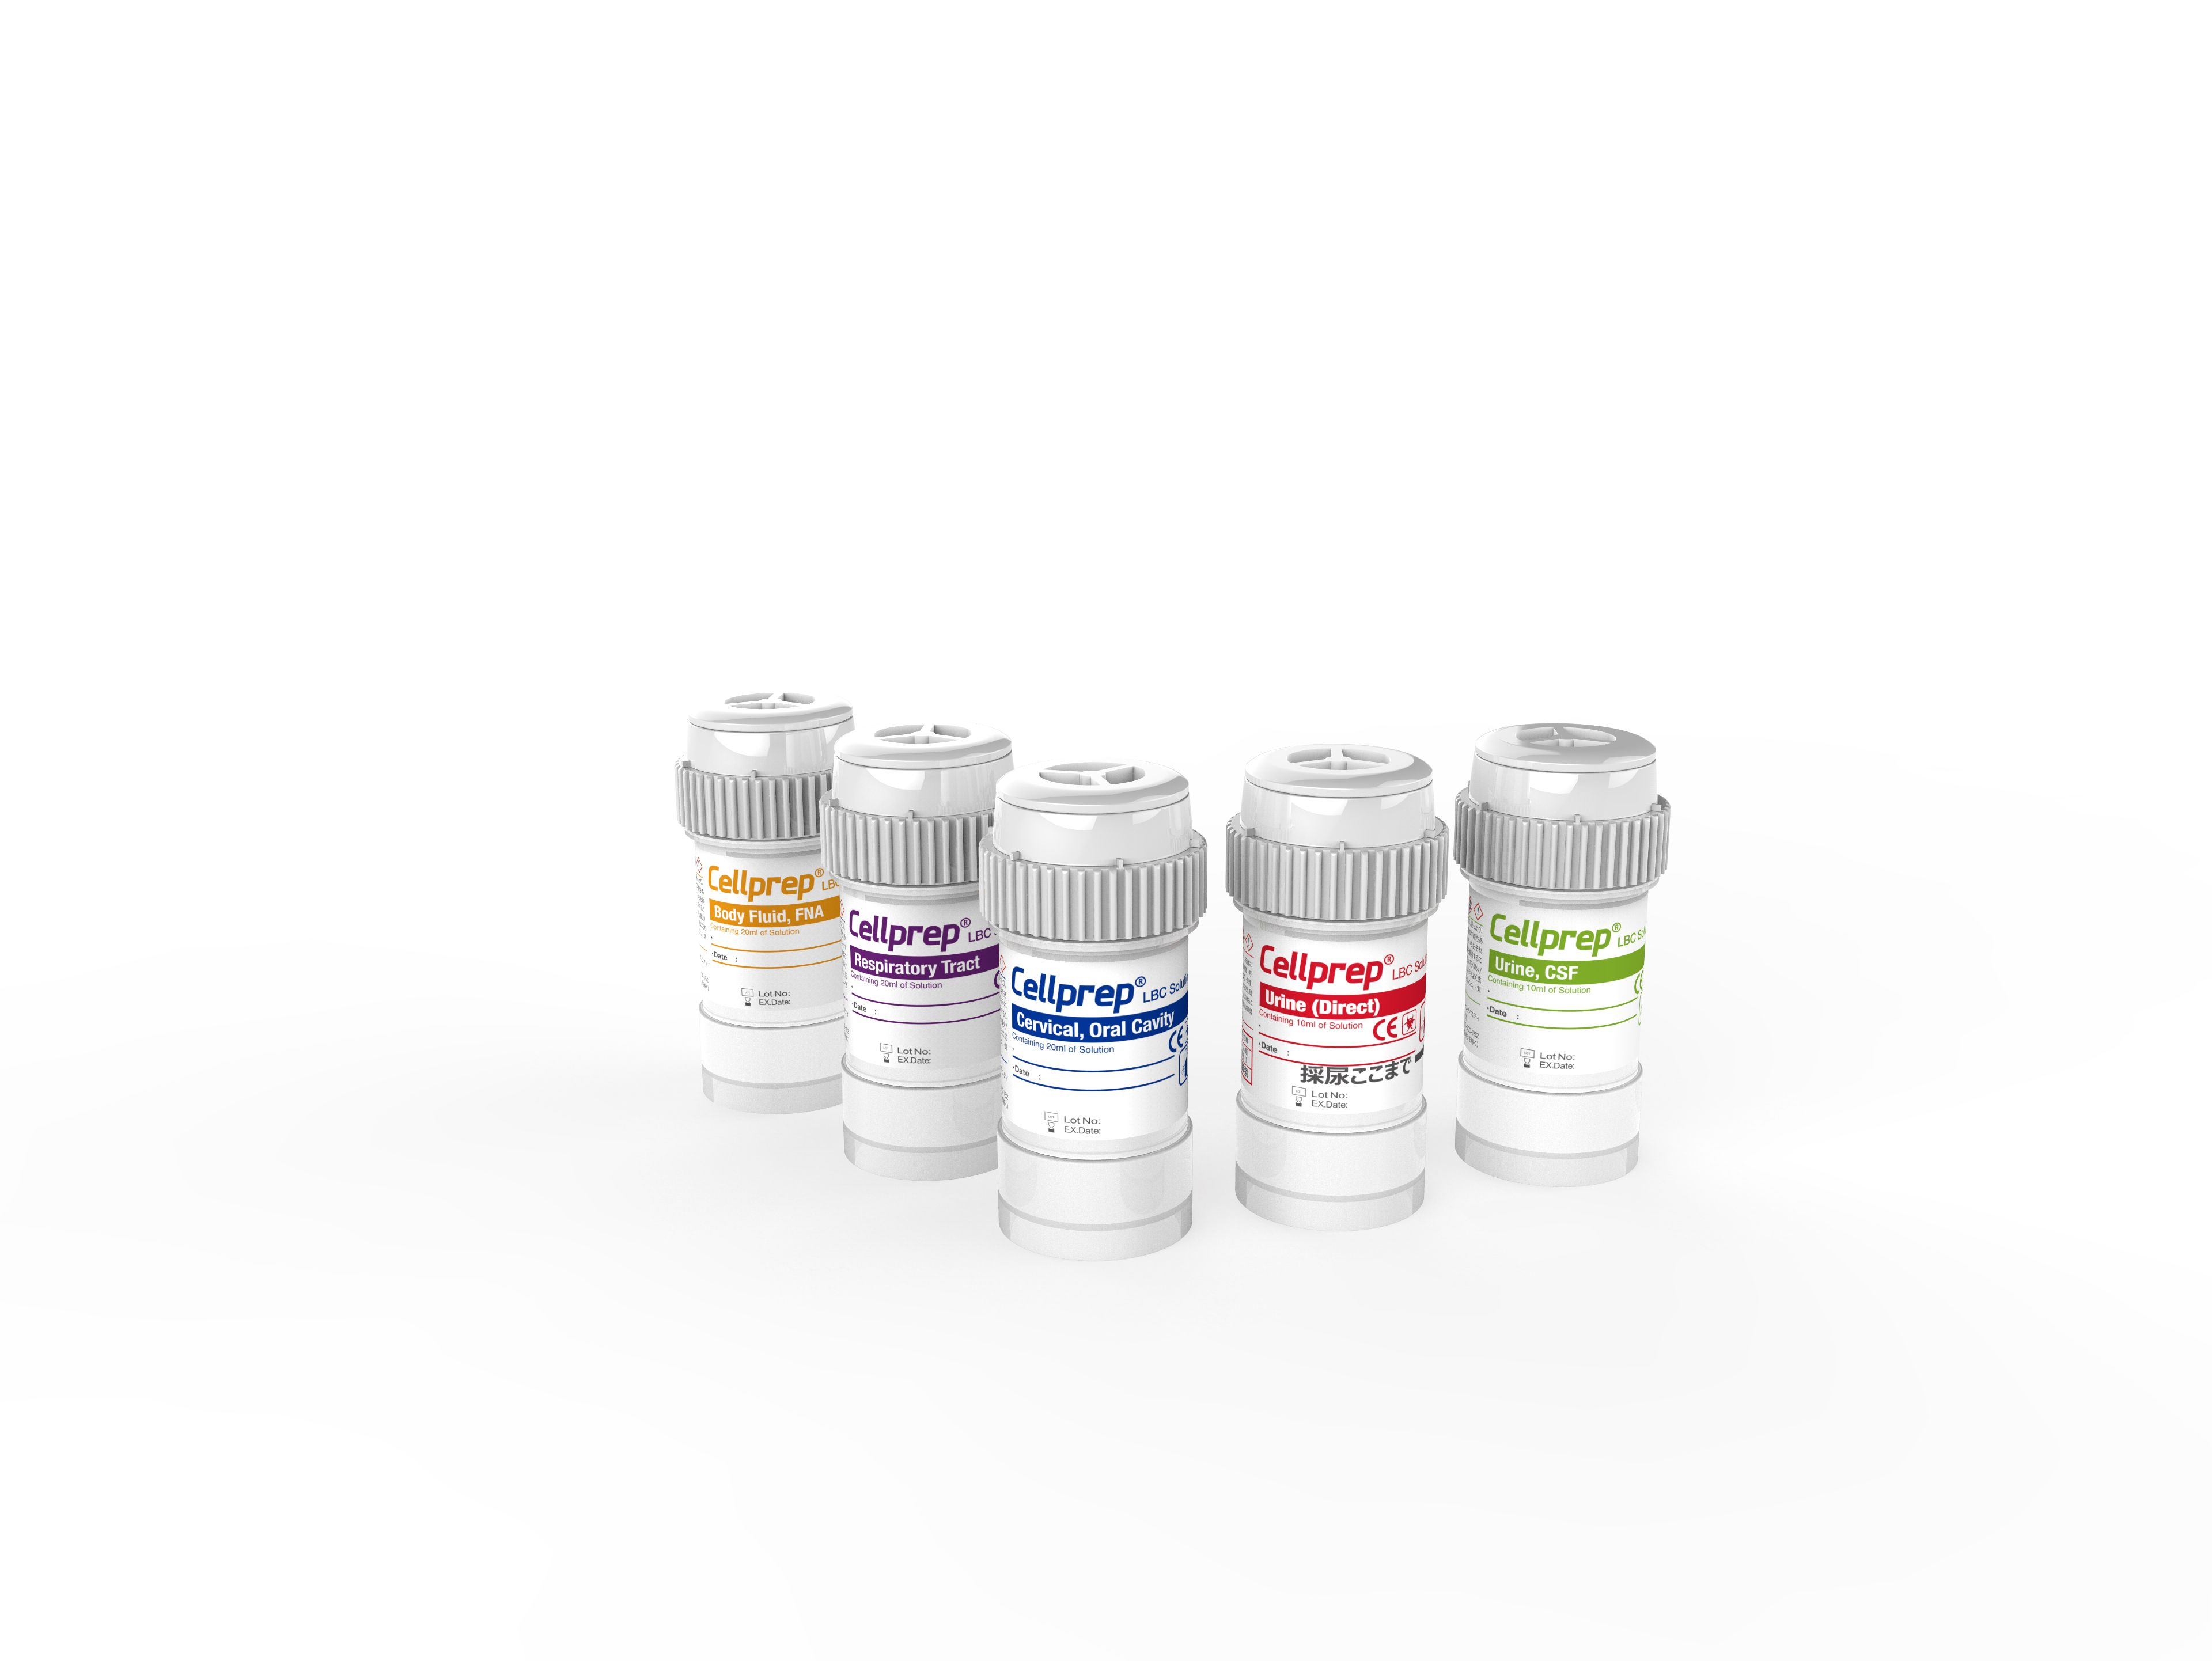 Cellprep vials